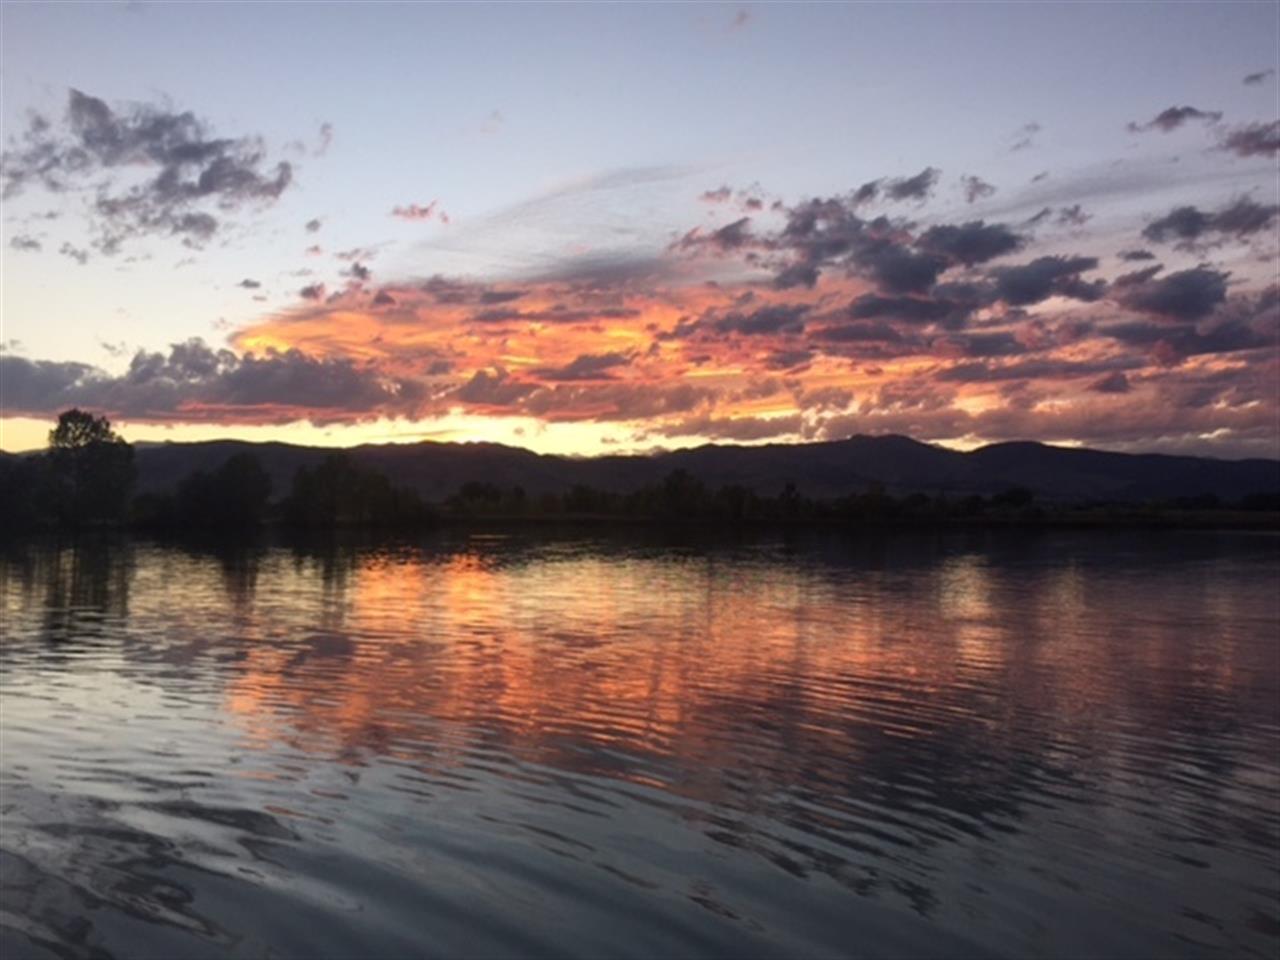 Sunset on Coot Lake - Boulder CO 9/17/15